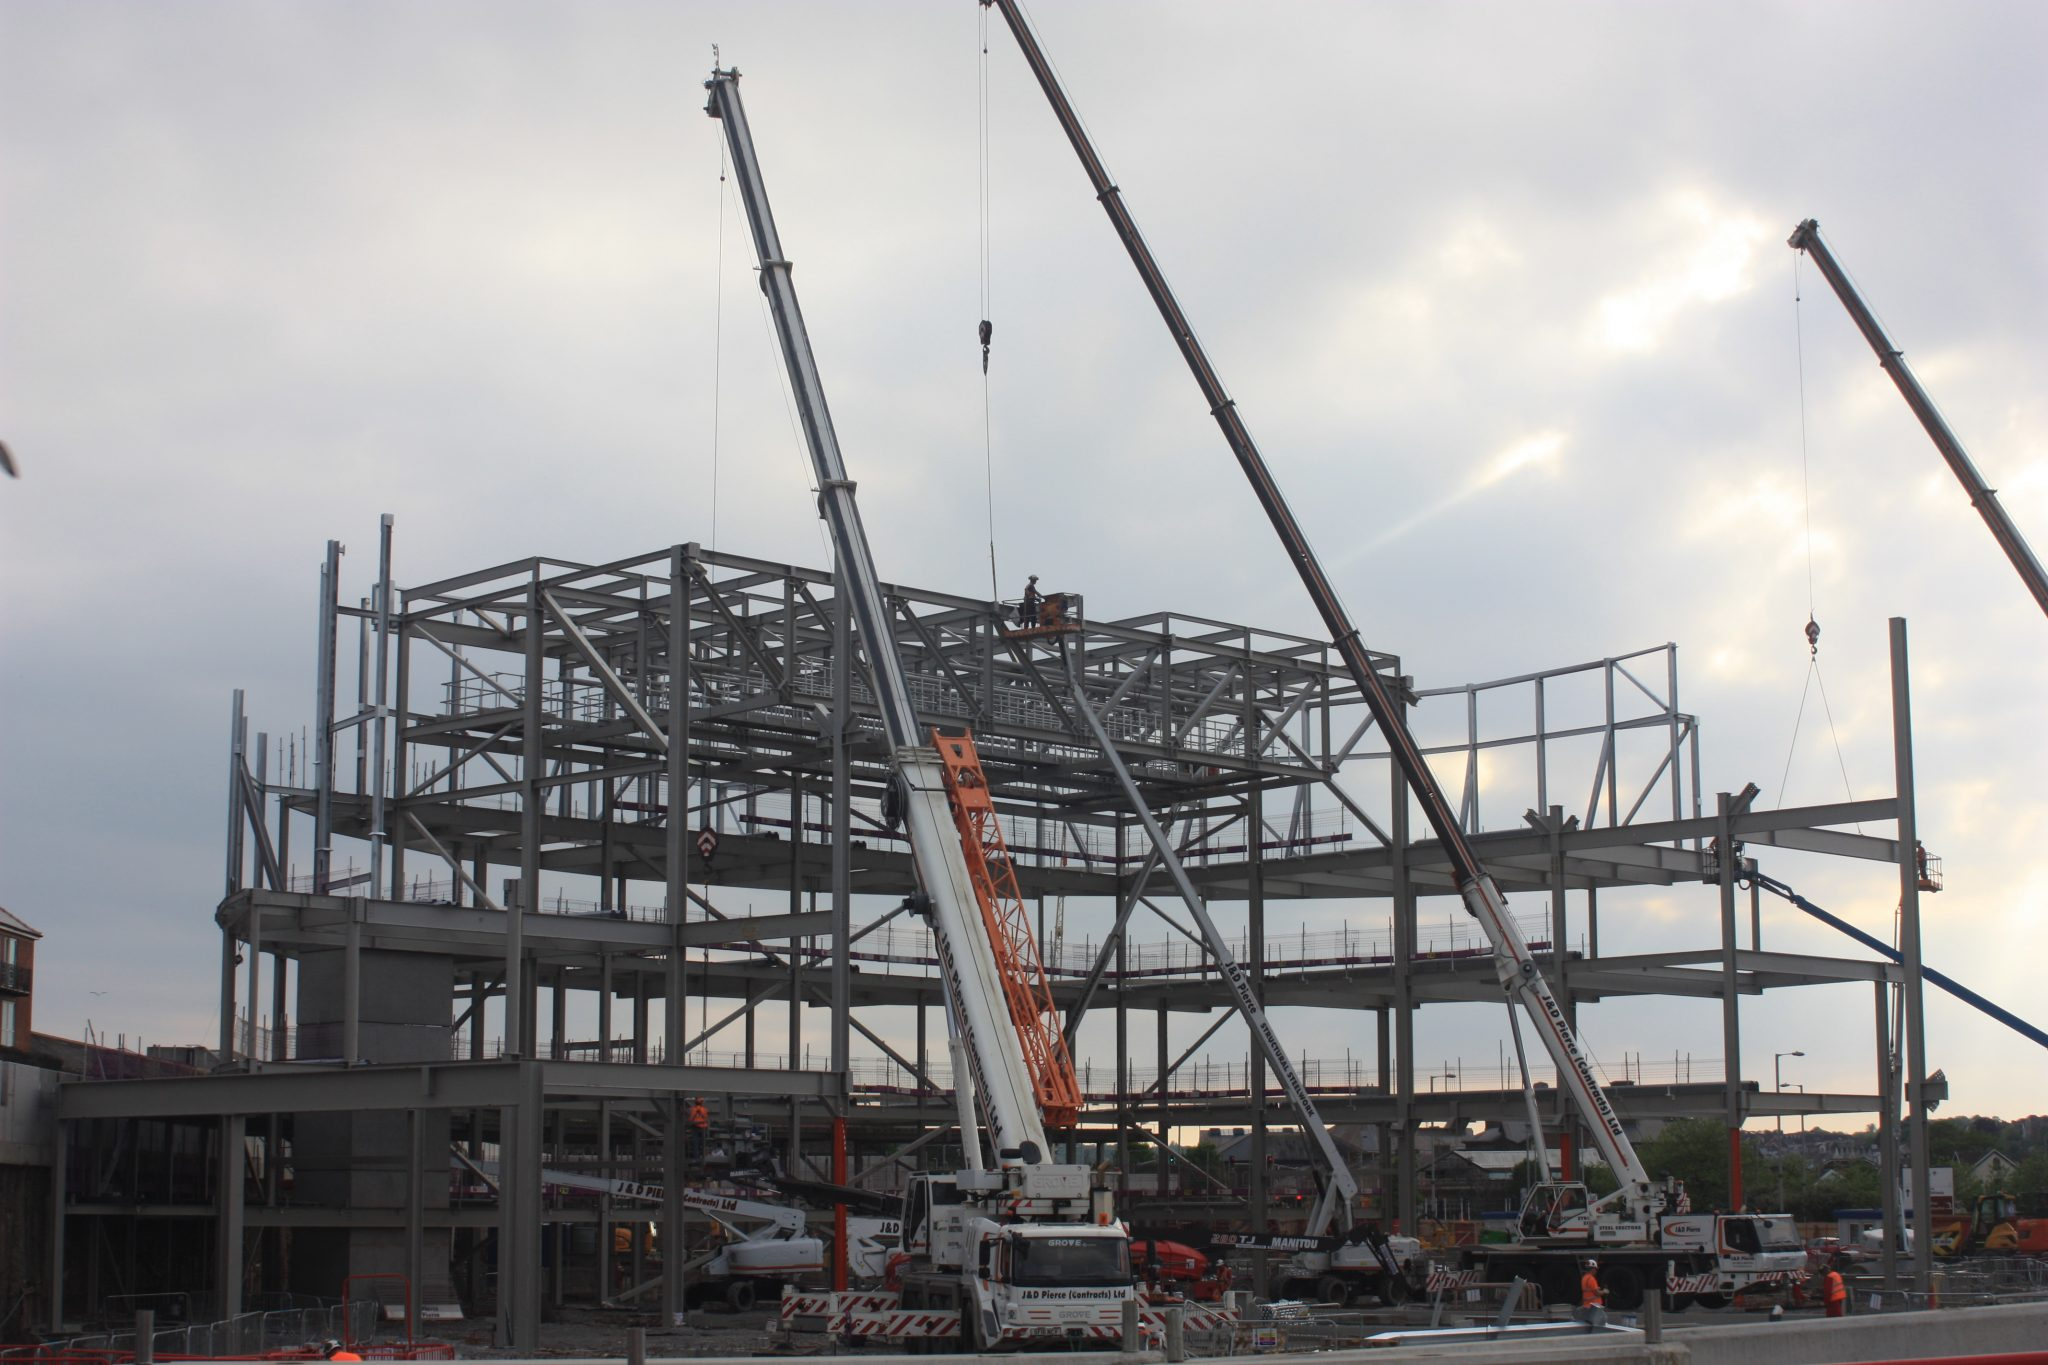 Swansea Arena - Cranes - JDPierce